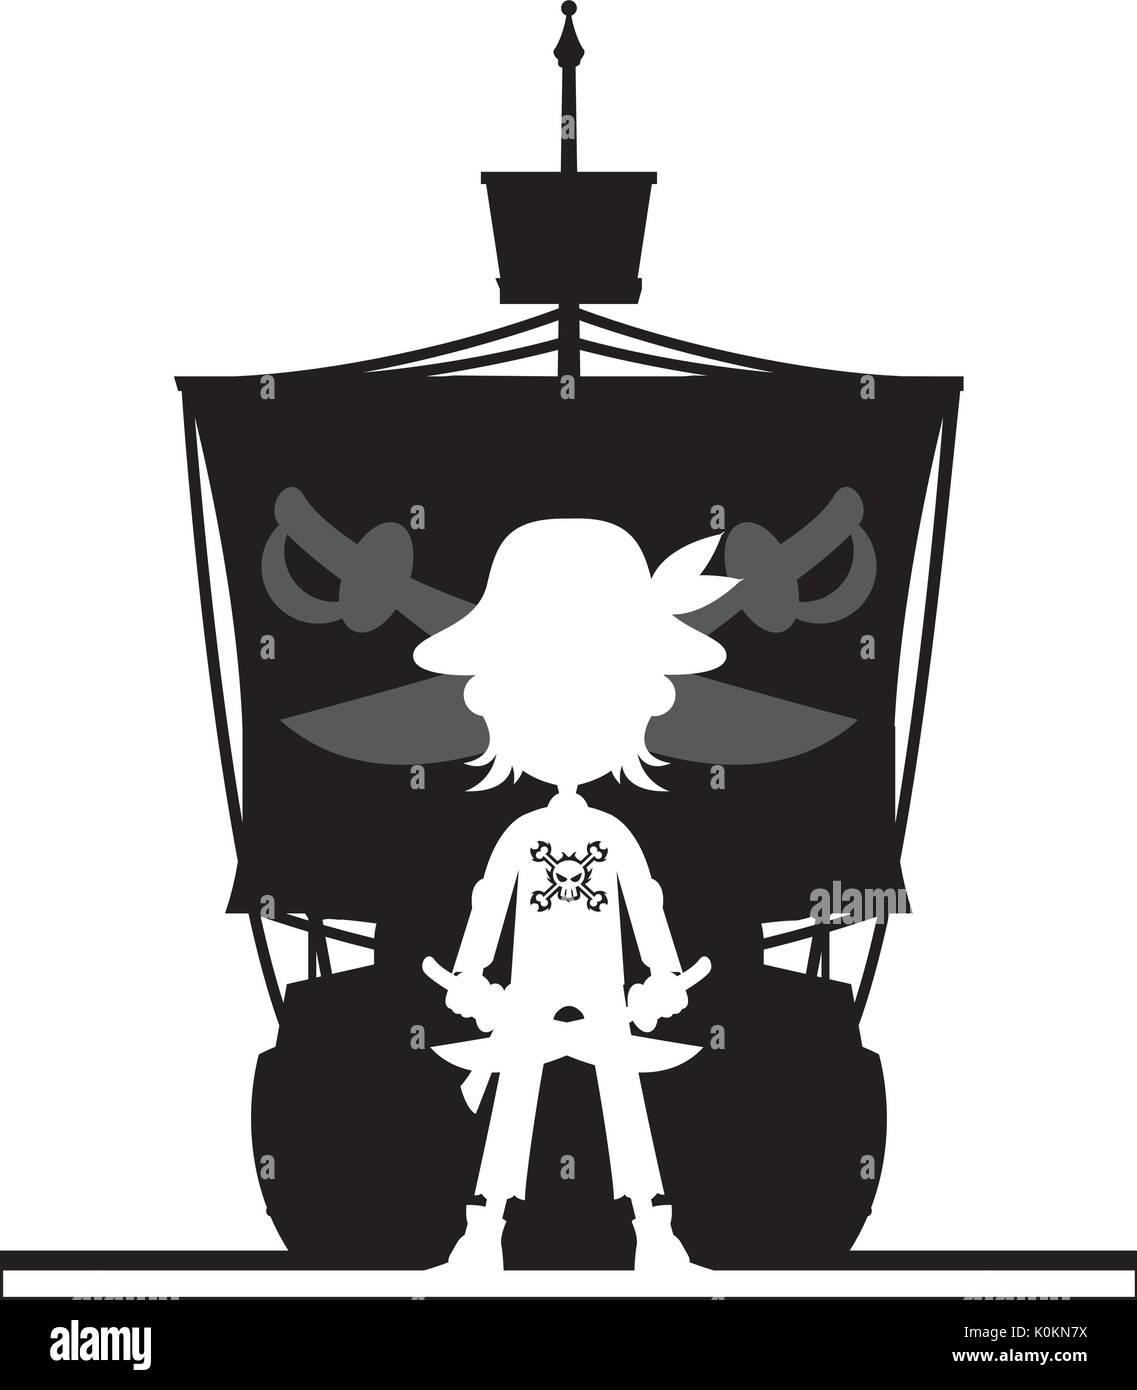 Pirate Ship Silhouette Vector